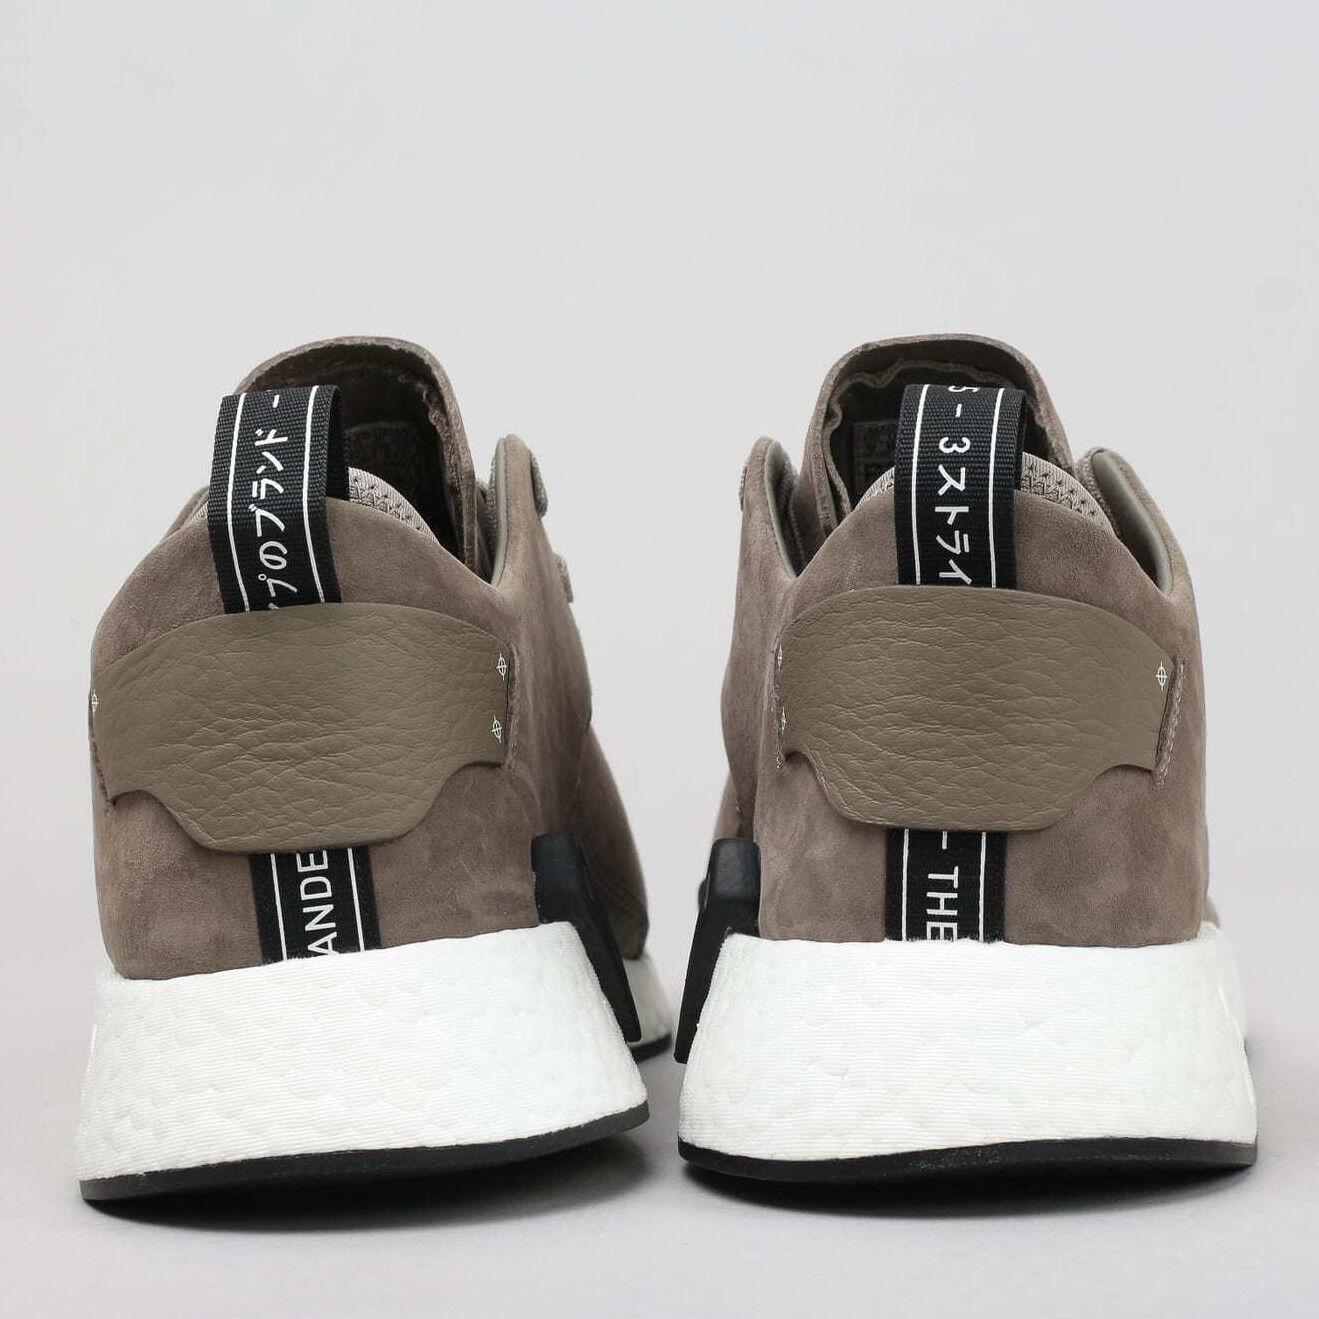 official photos 271b2 da180 Мужская спортивная обувь Mens ADIDAS Originals NMD C2 Taupe Brown Casual  Sneakers BY9913 NEW